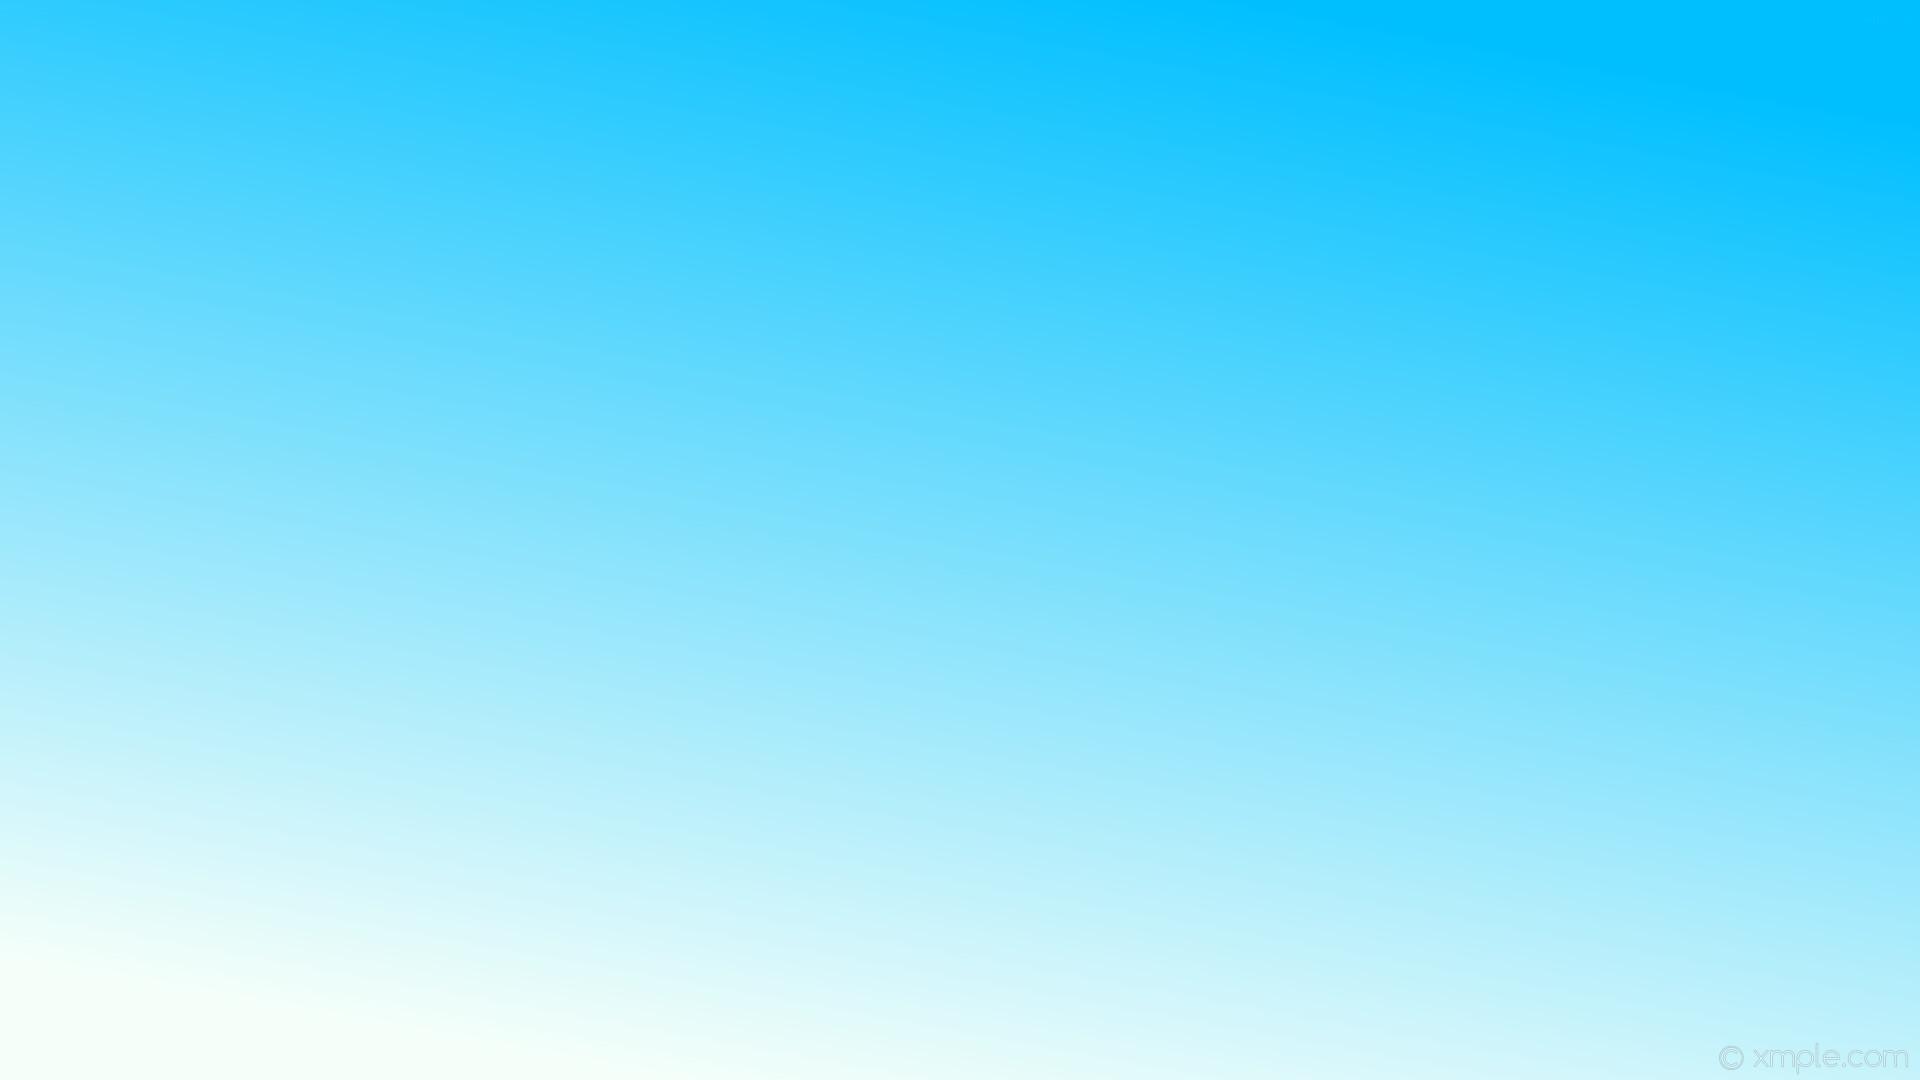 wallpaper gradient blue linear white deep sky blue mint cream #00bfff  #f5fffa 60°